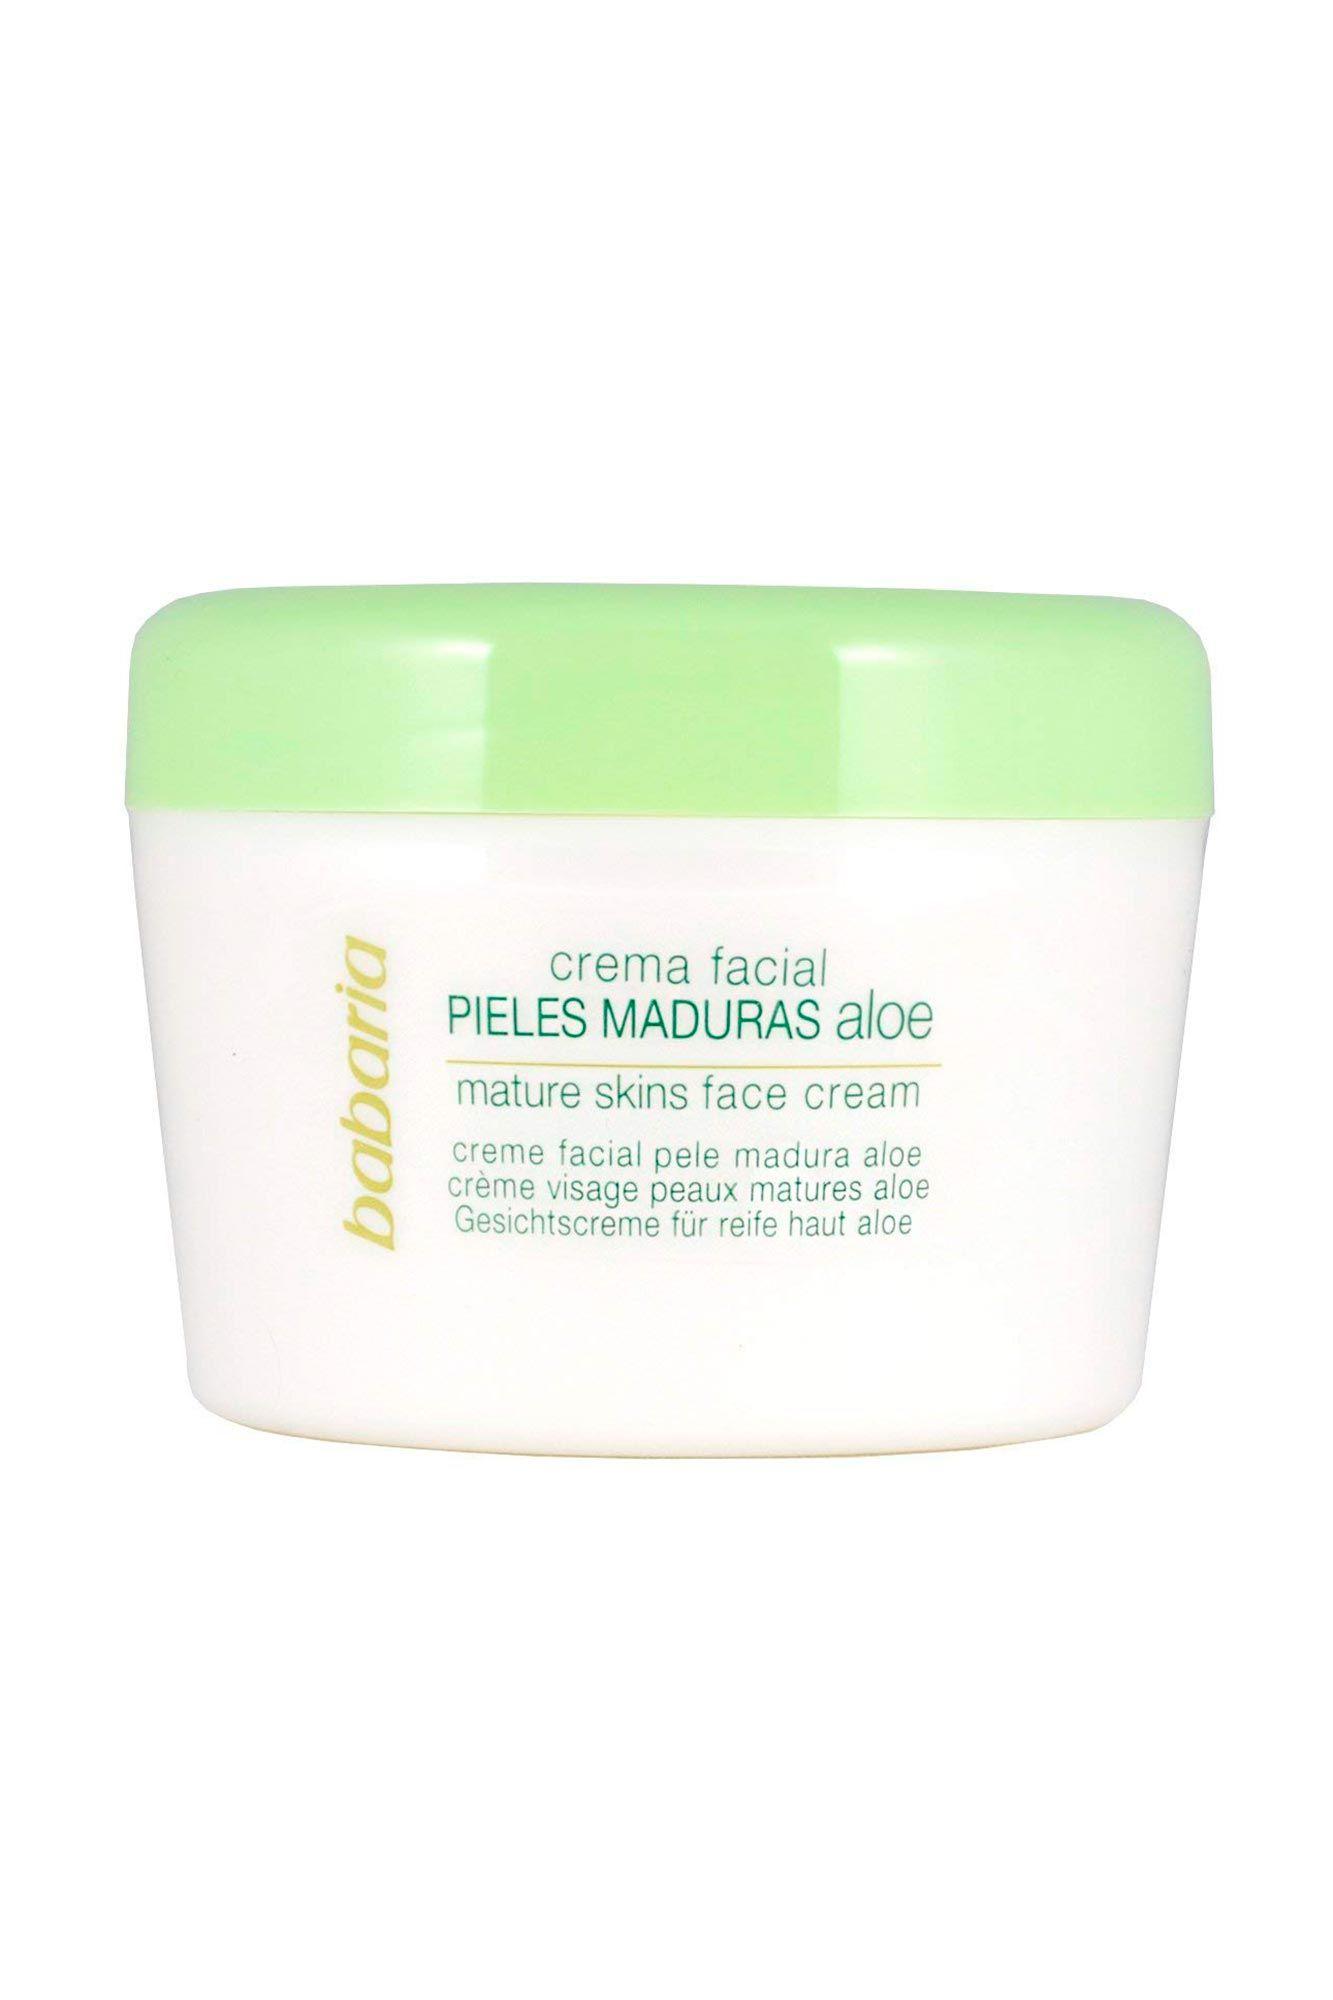 mejor crema reafirmante ovalo facial 2020